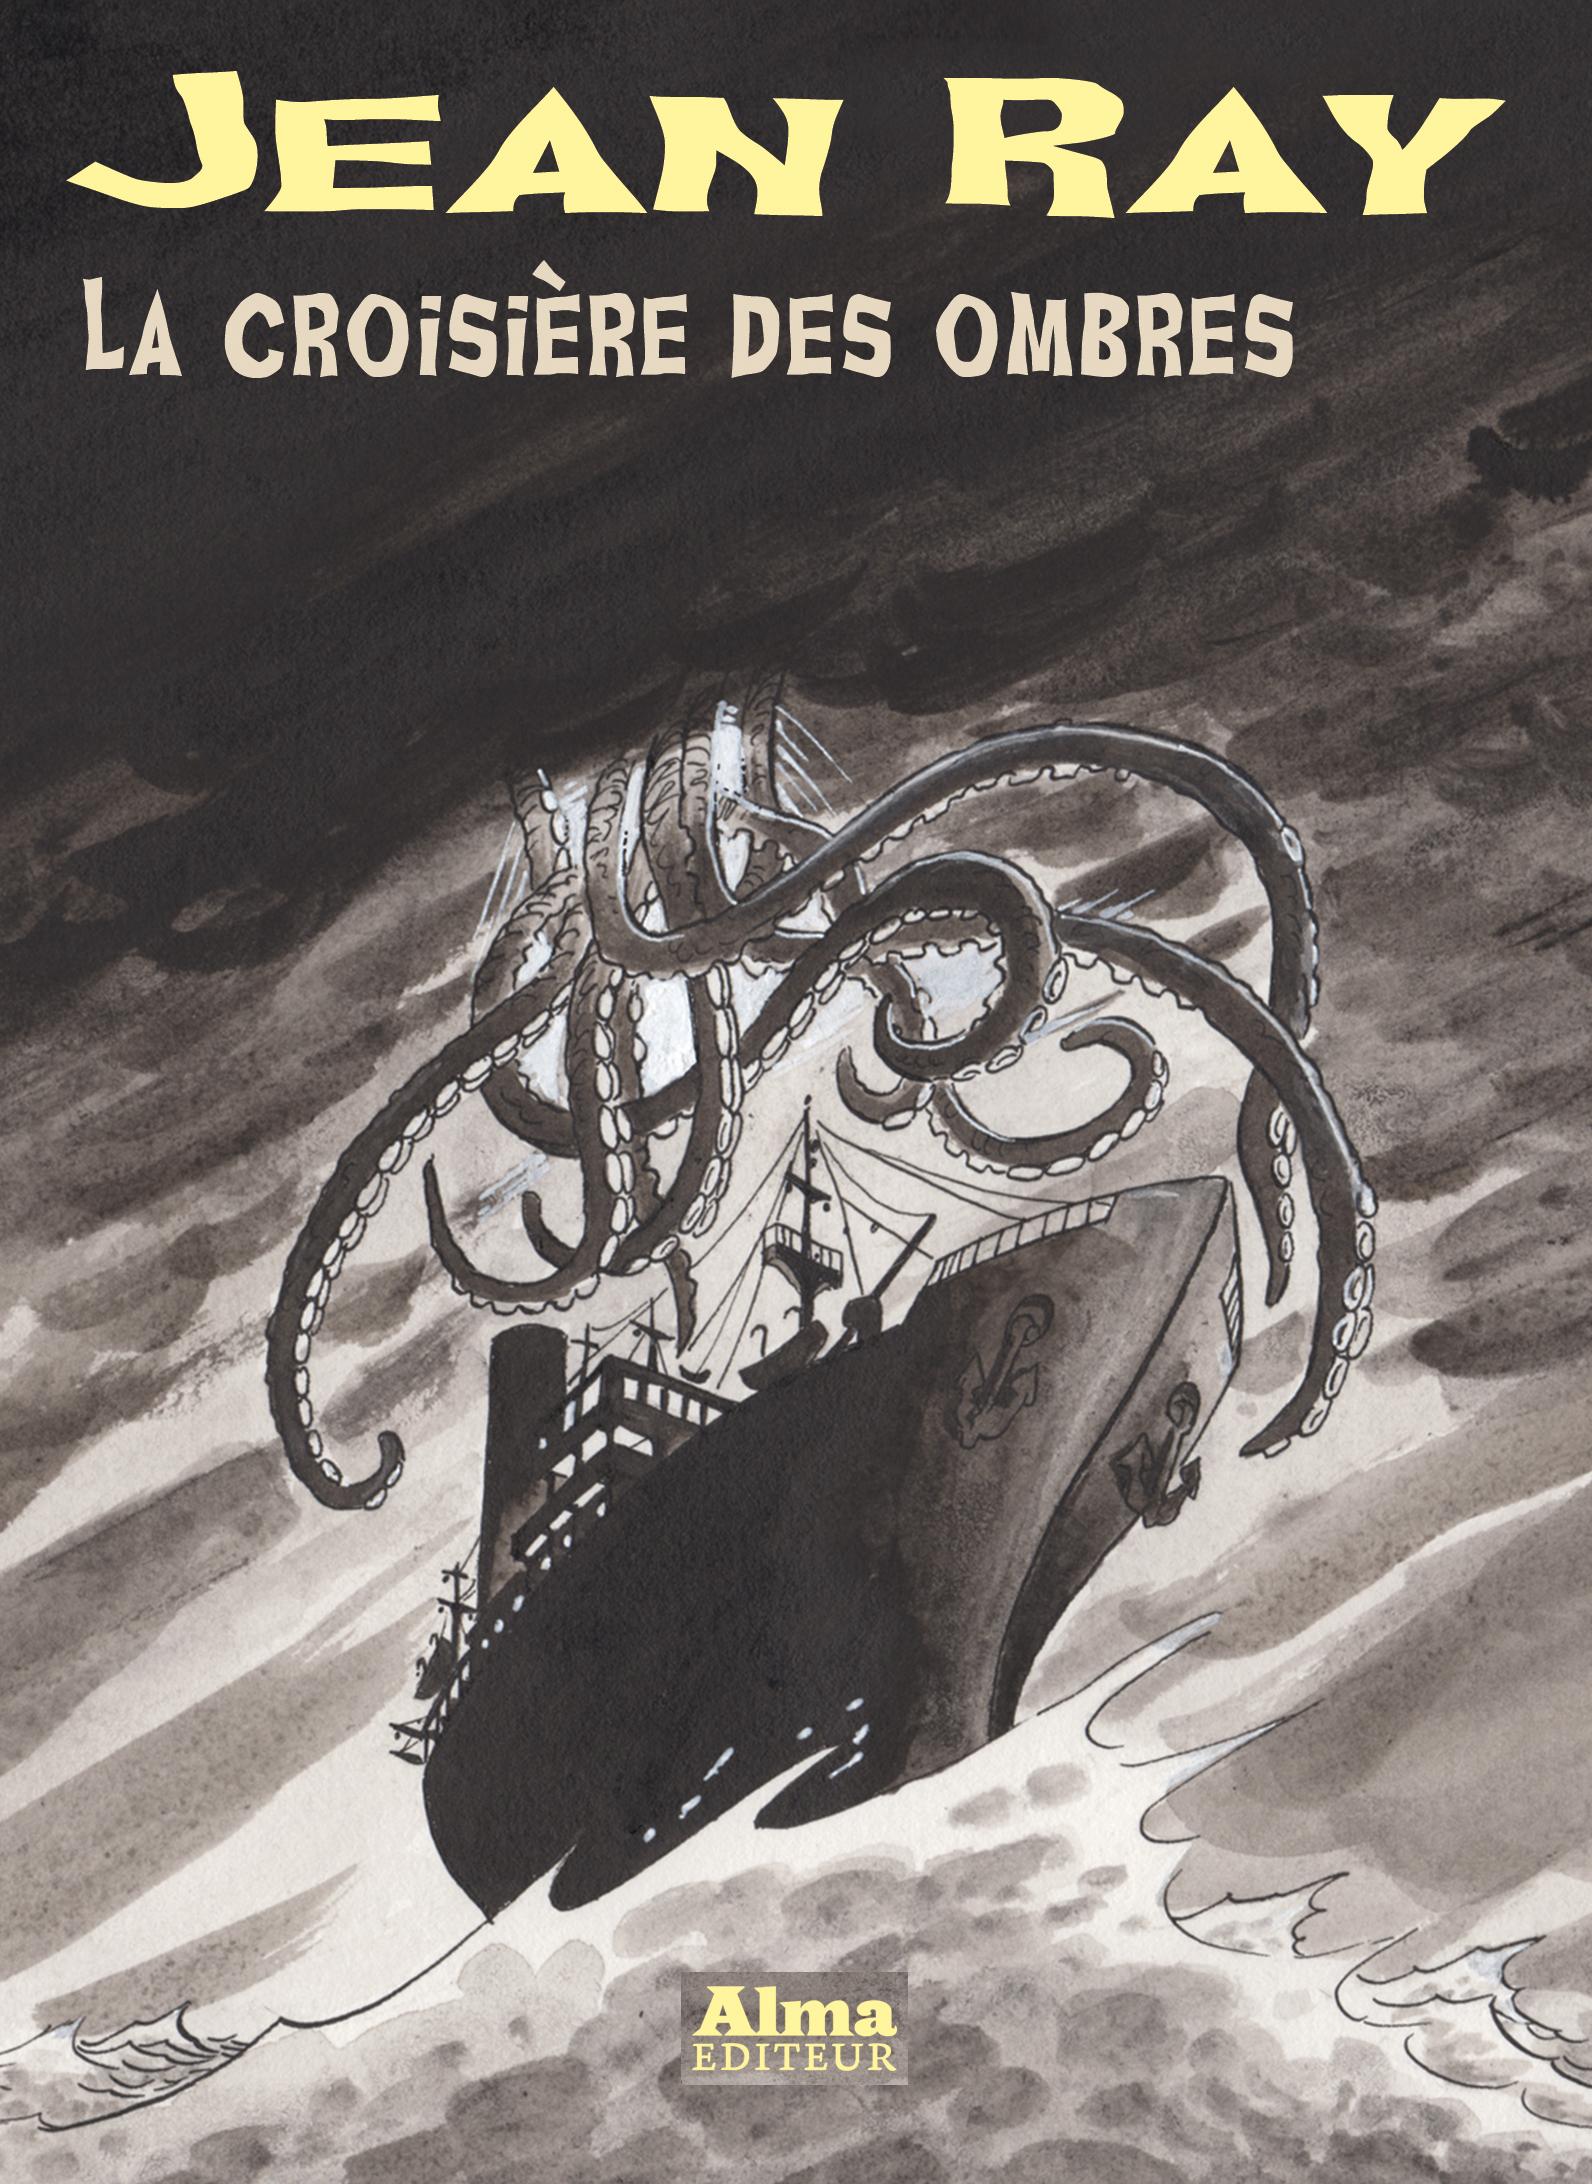 La croisière des ombres Jean Ray Philippe Foerster Mu Blondeau Alma